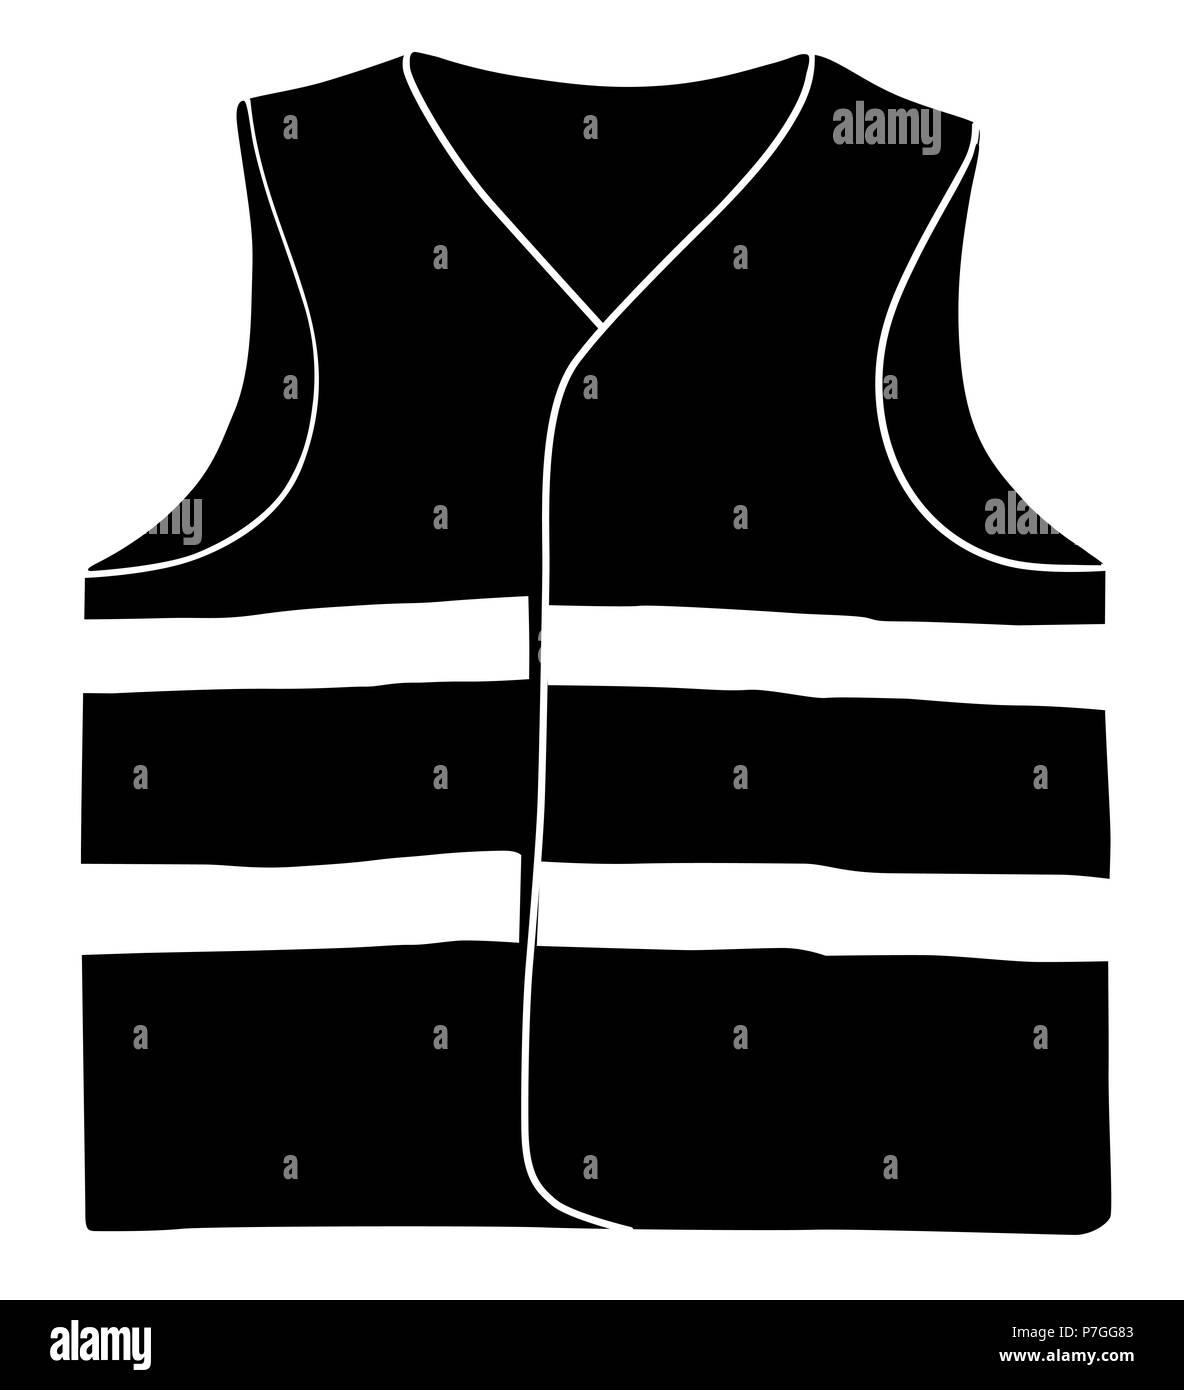 Safety vest isolate on white background - Stock Image